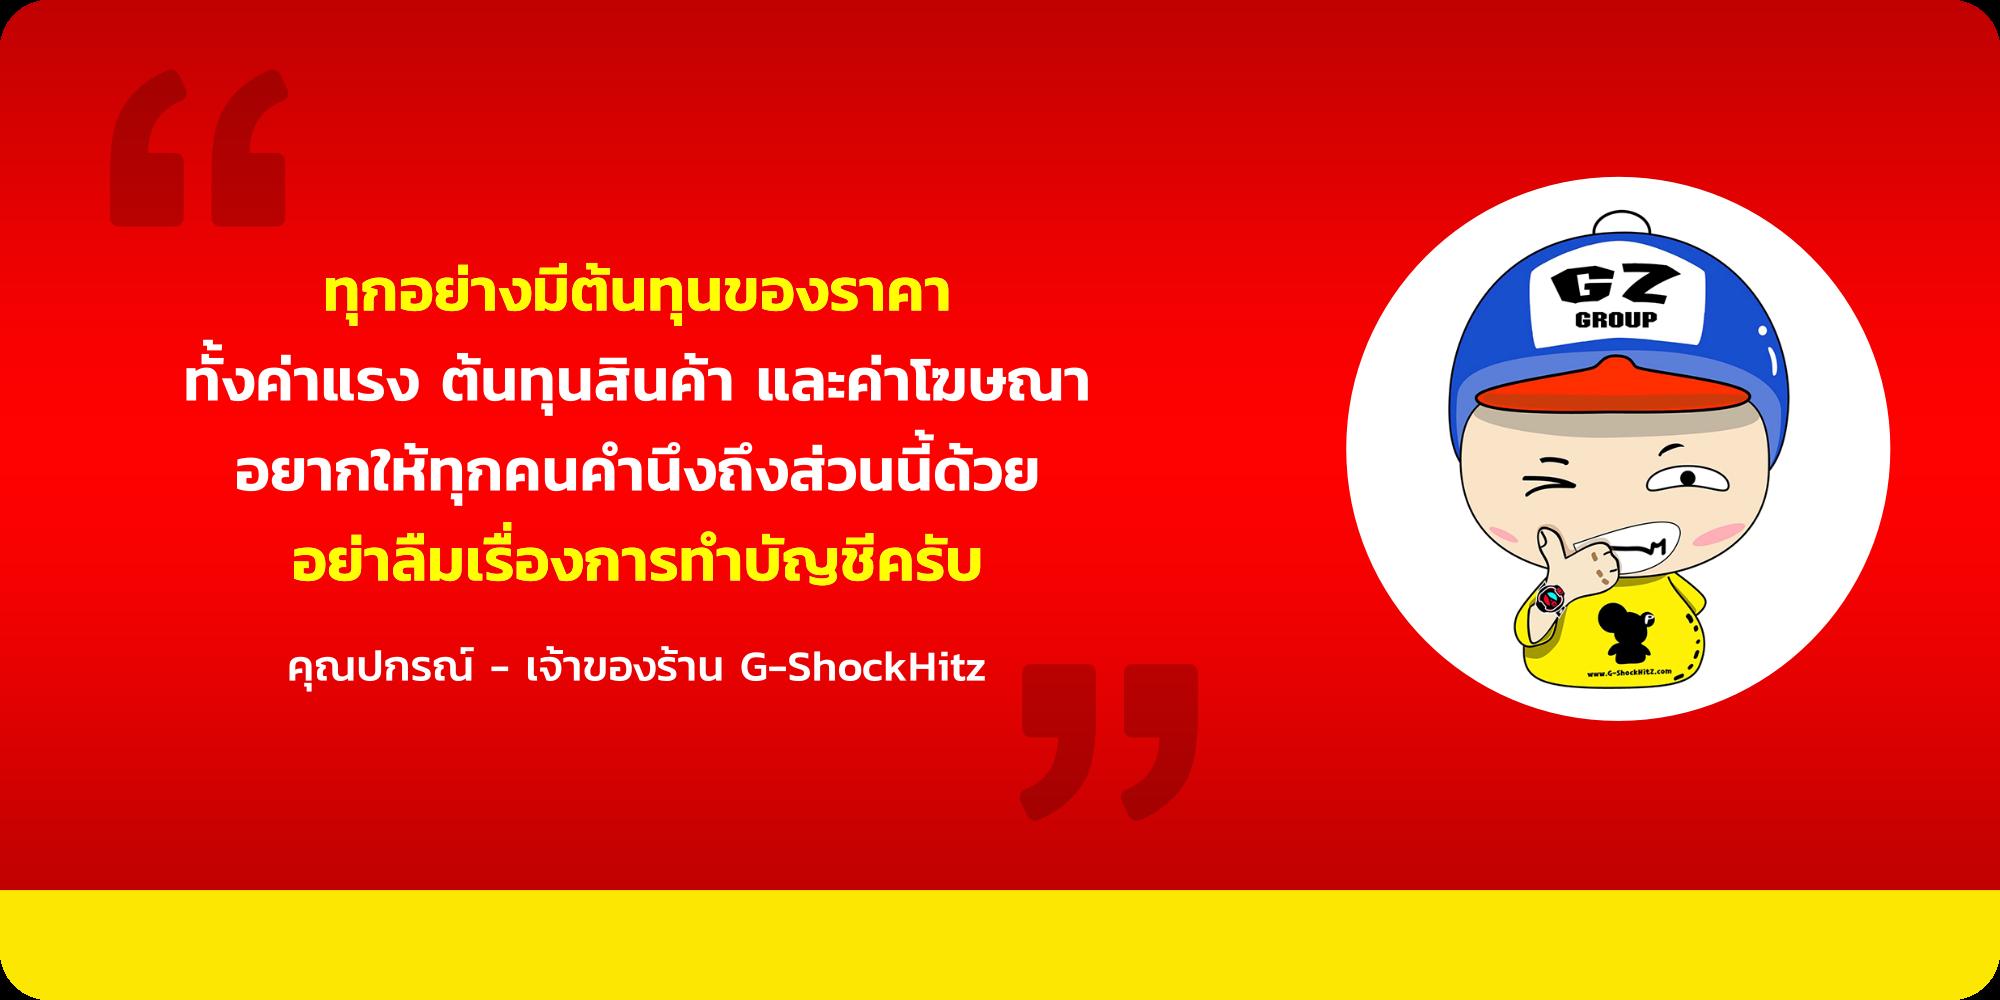 G-ShockHitz - Quote